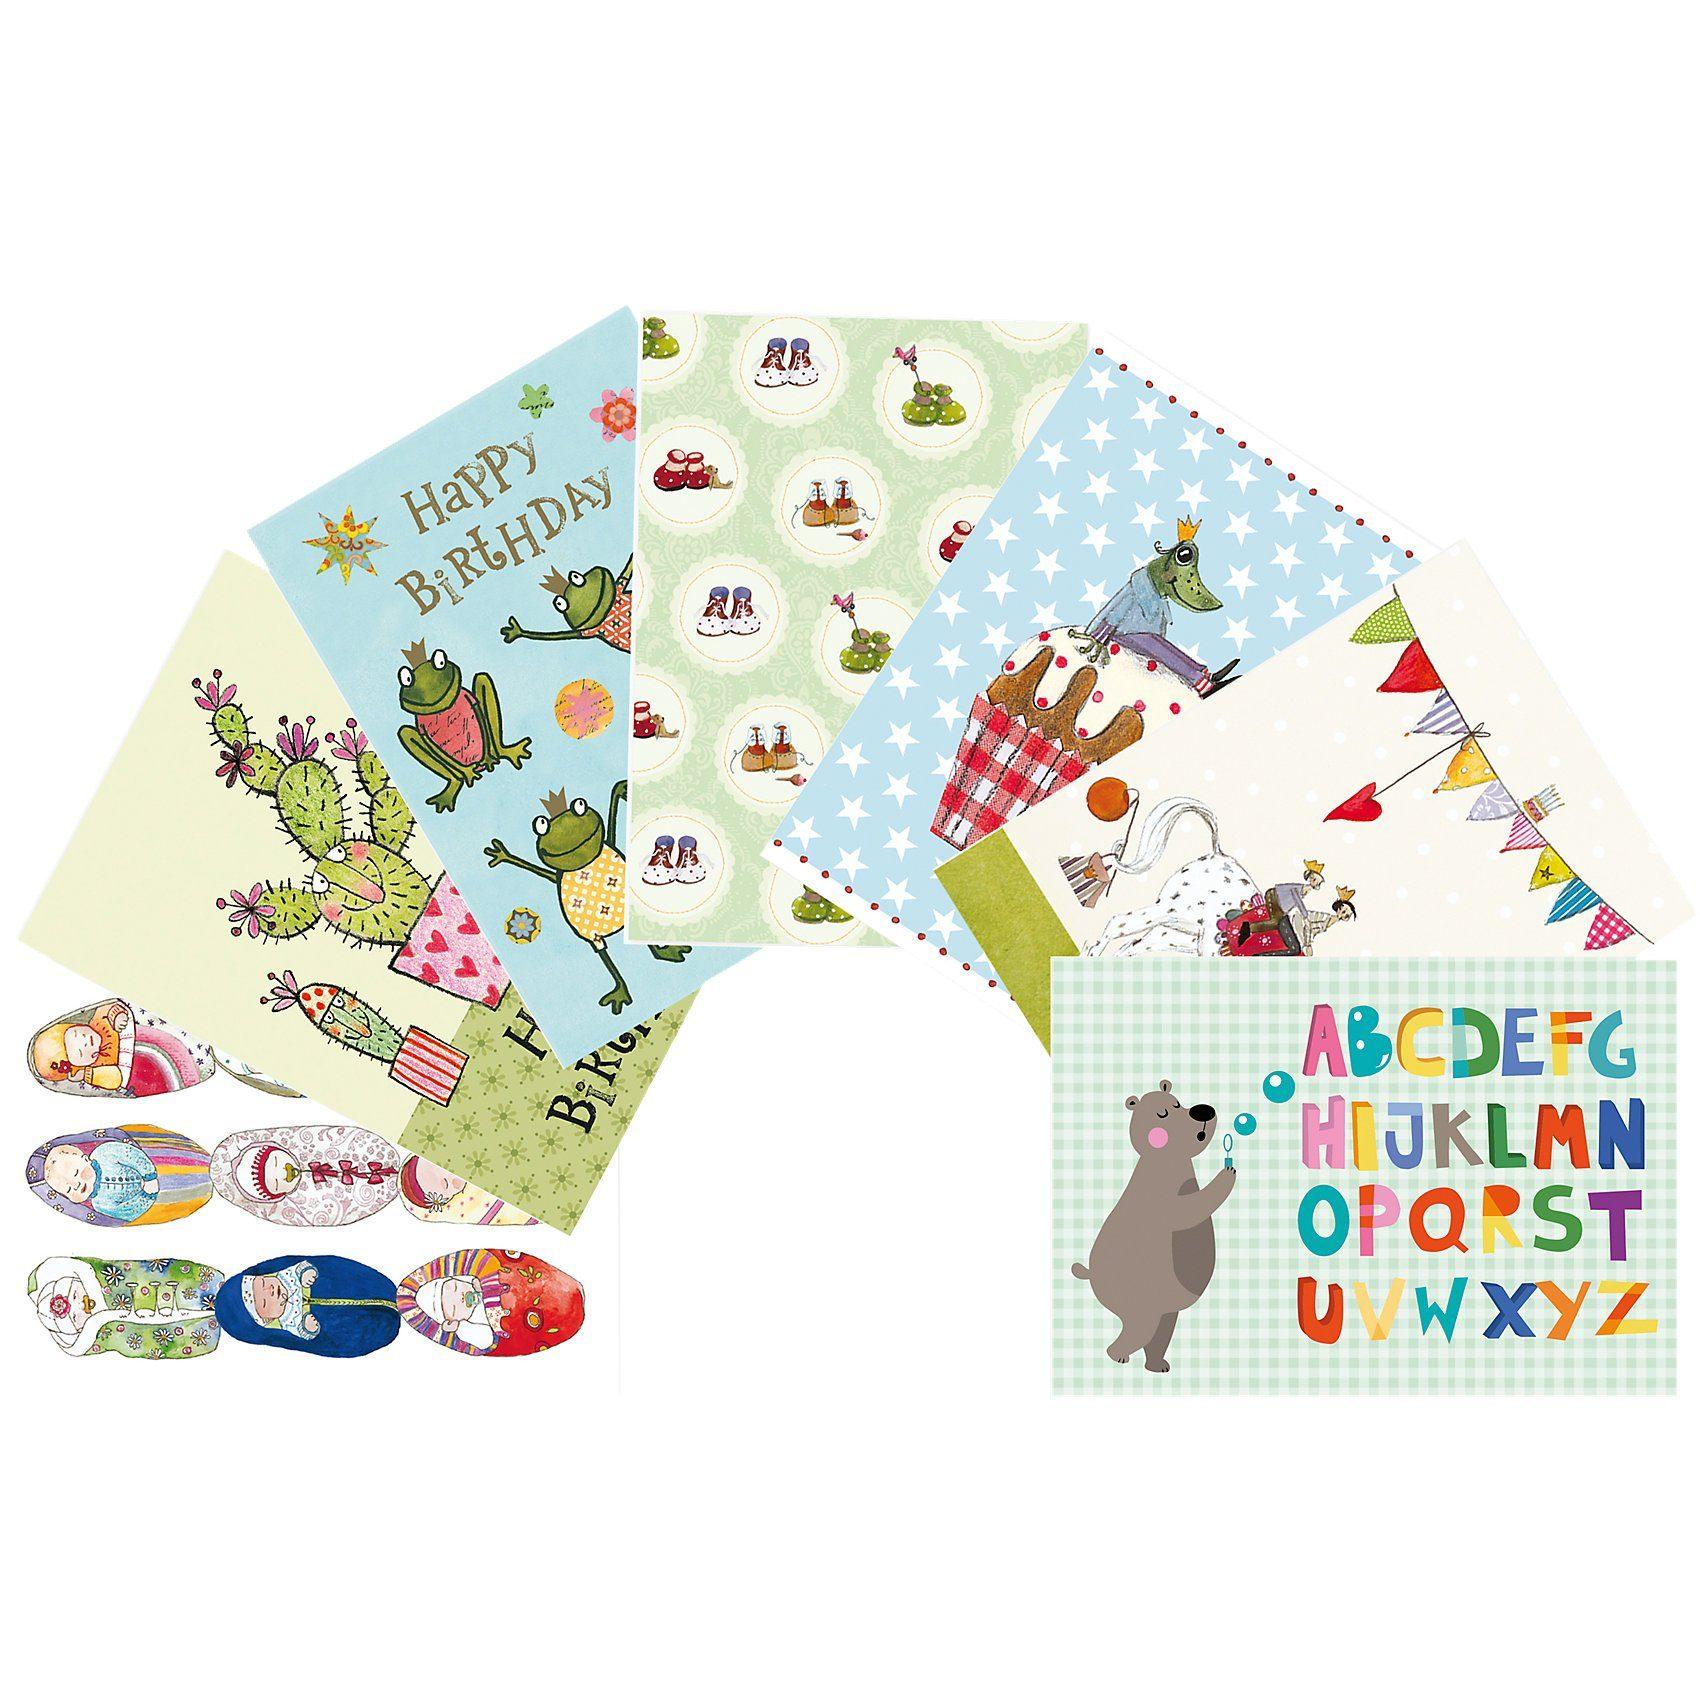 Grätz Verlag Kinder-Postkarten-Set, 7 Stück